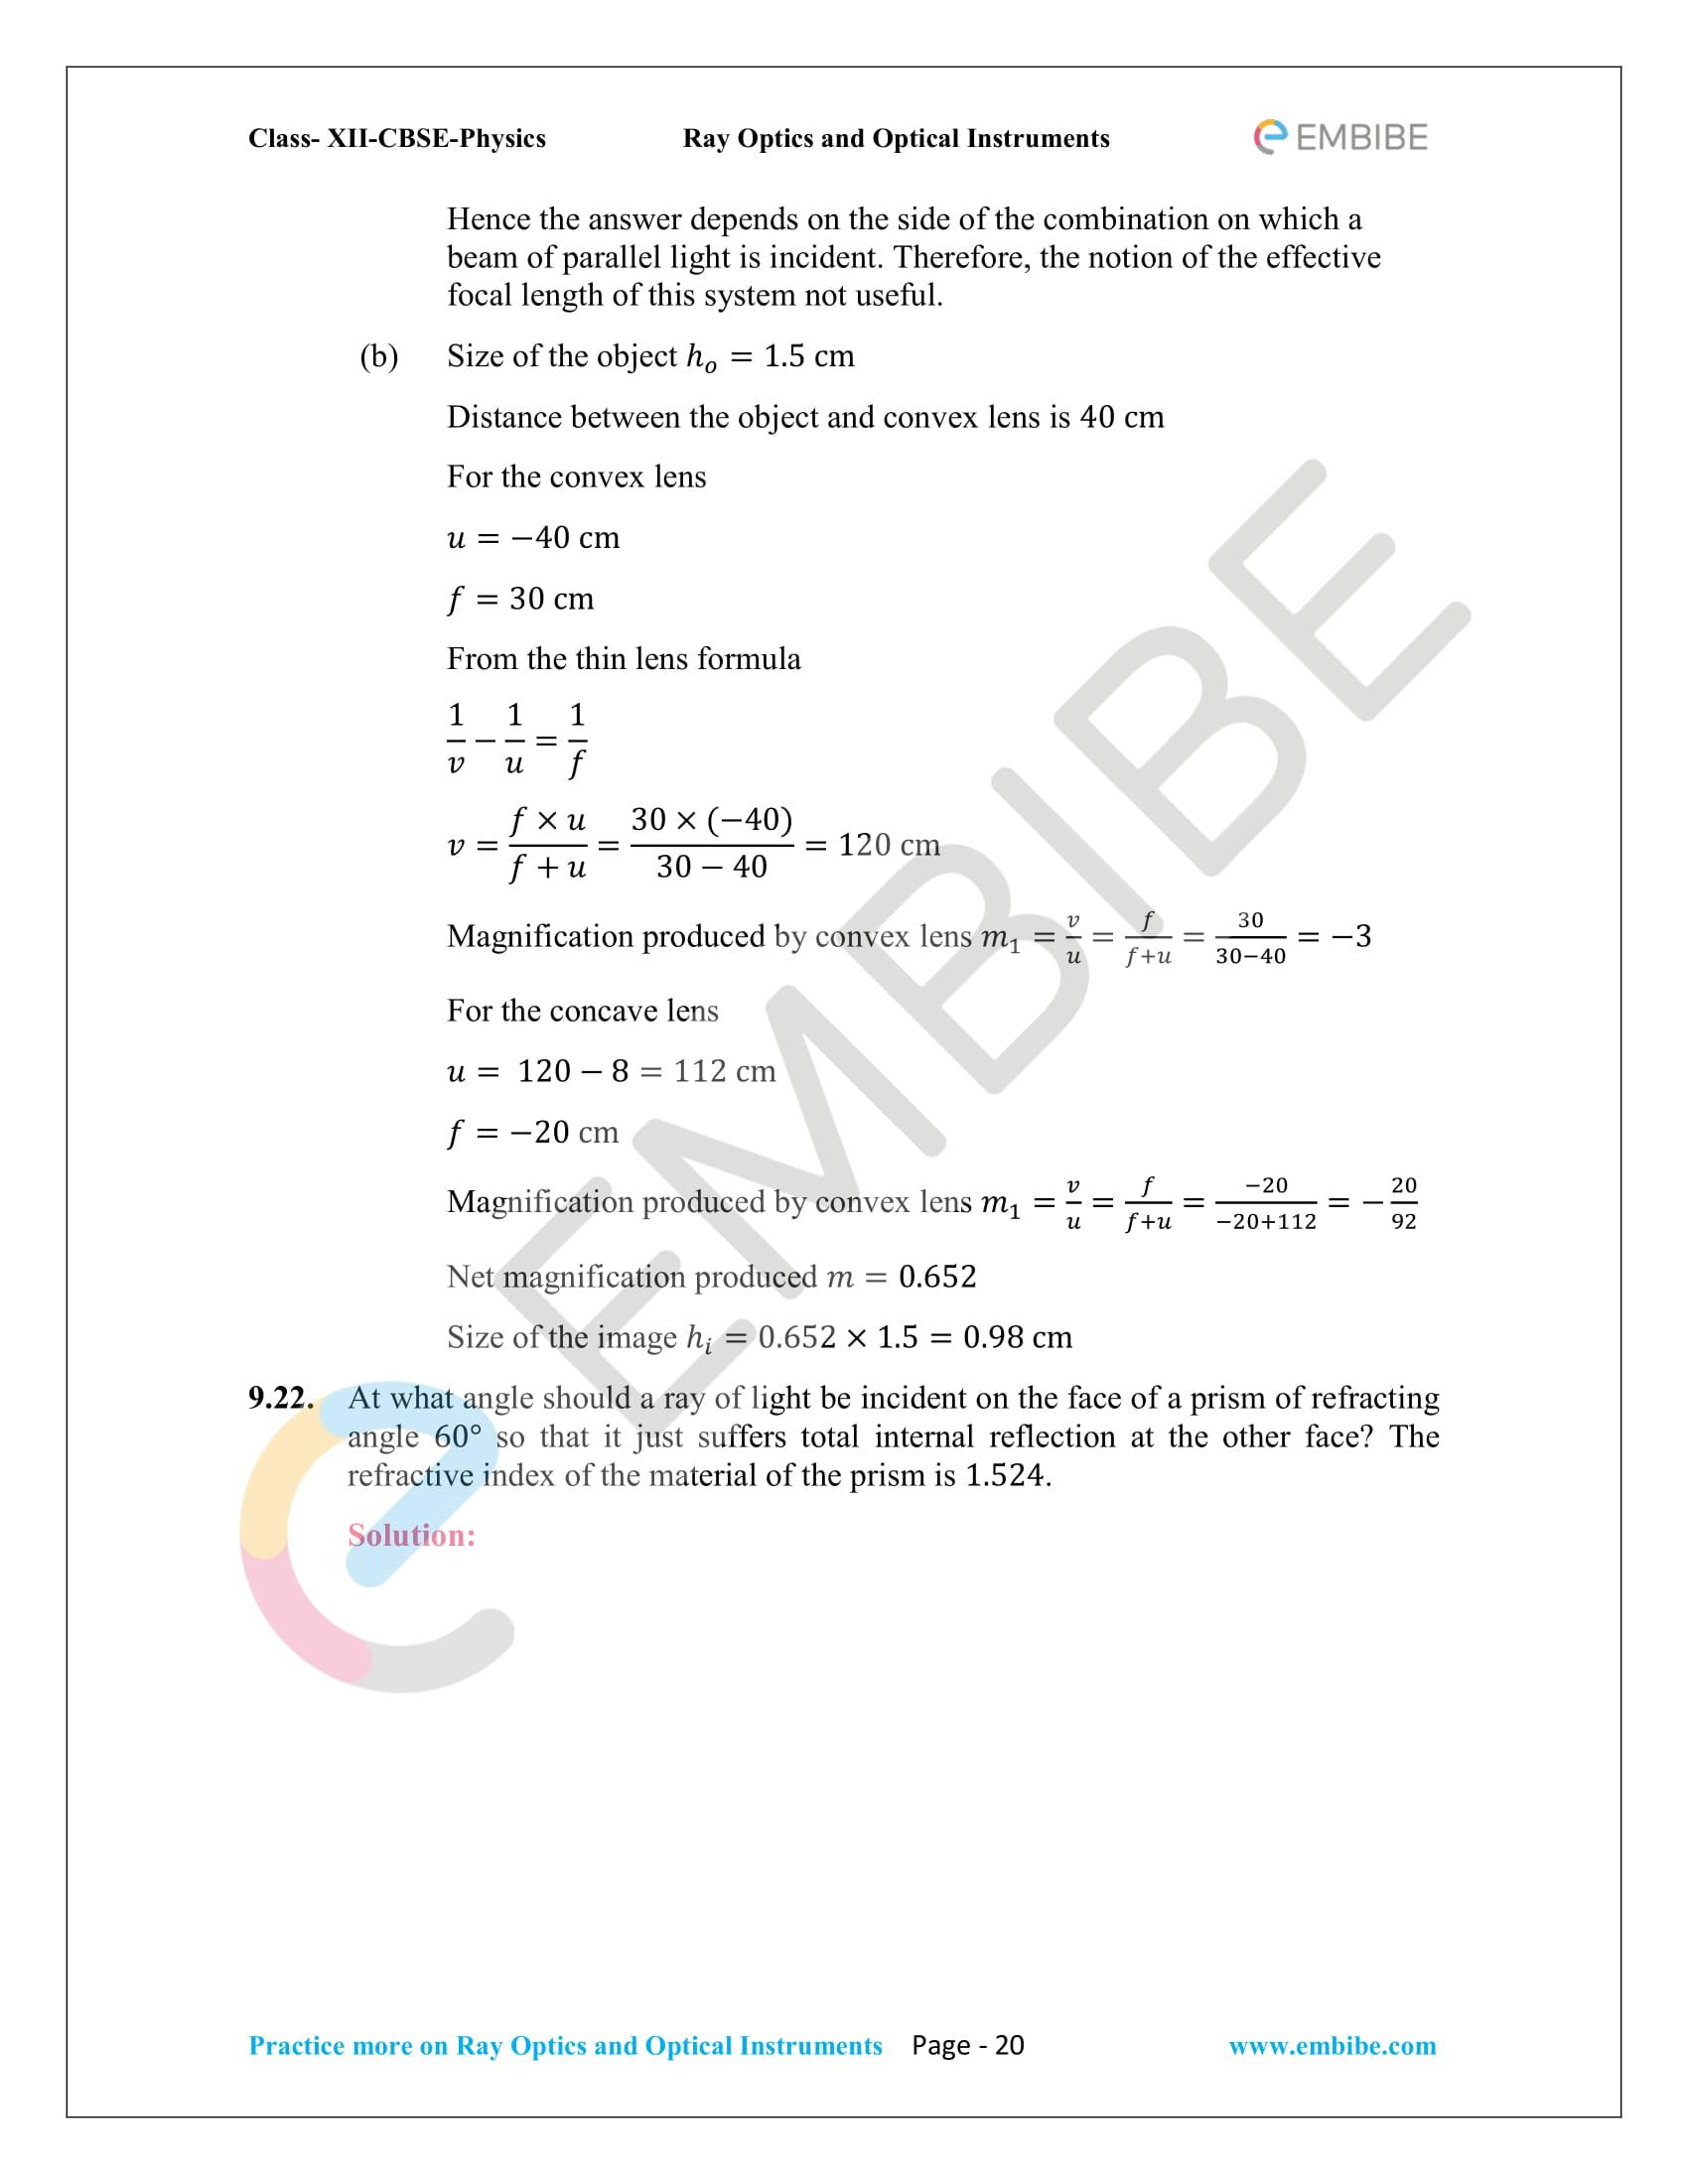 NCERT_Grade 12_Physics_Ch_09_Ray Optics-20